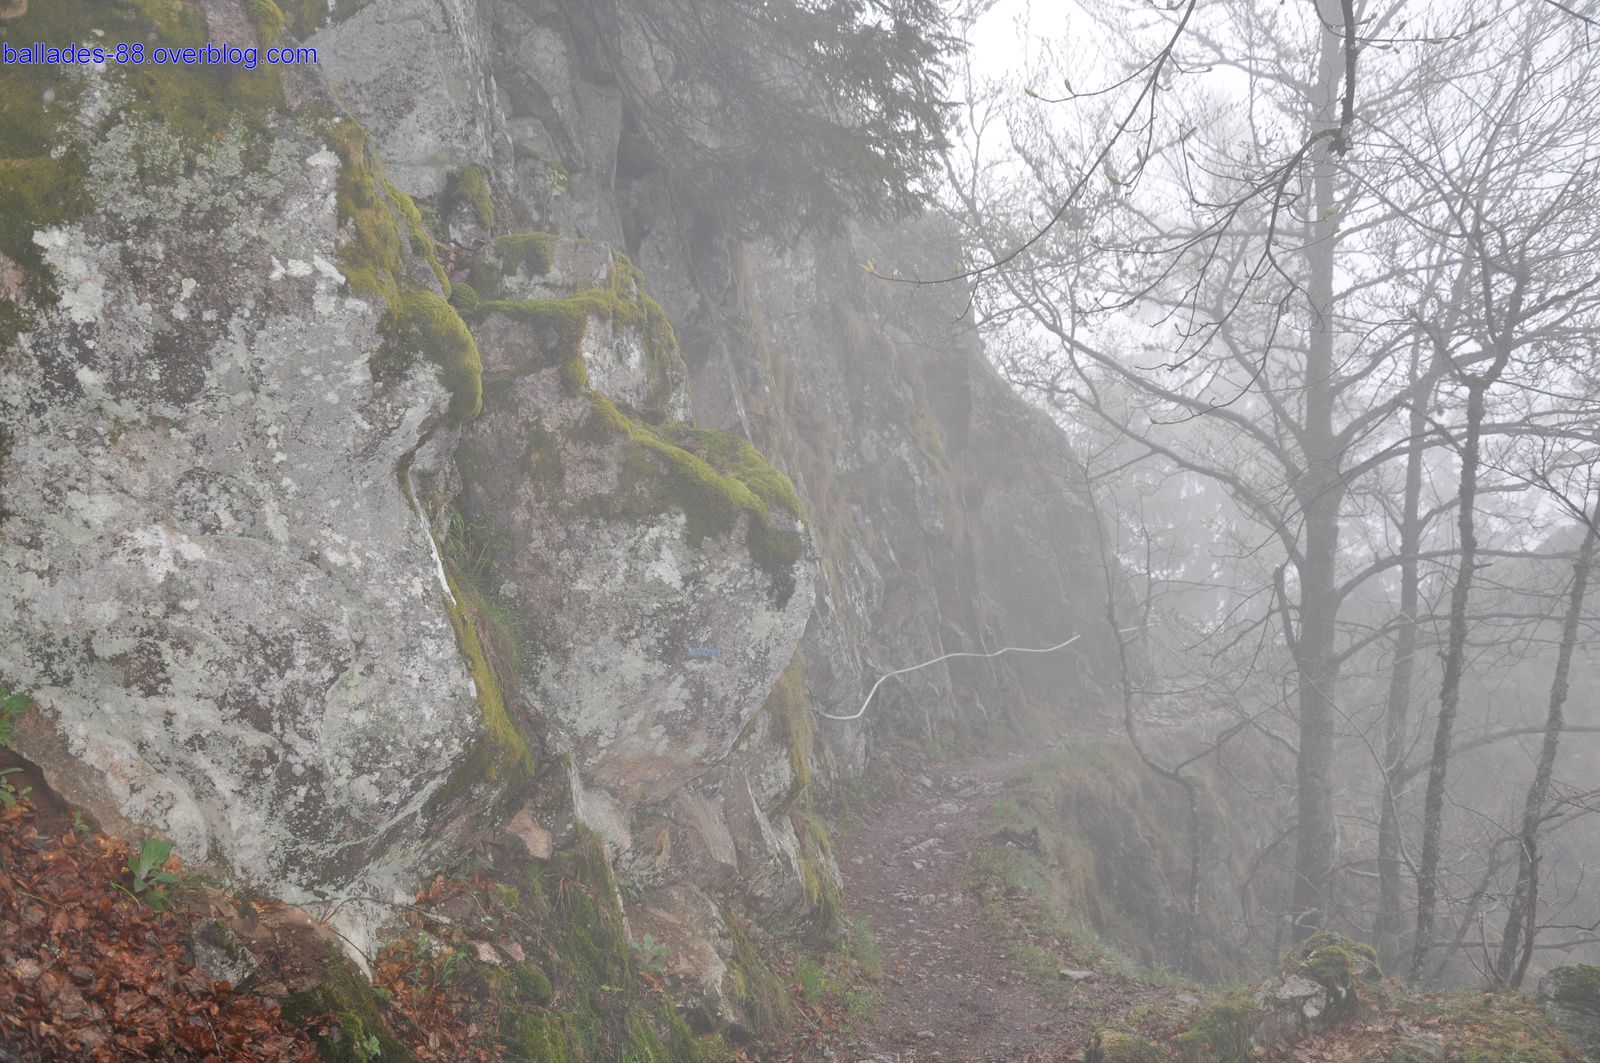 Sentier des roches.